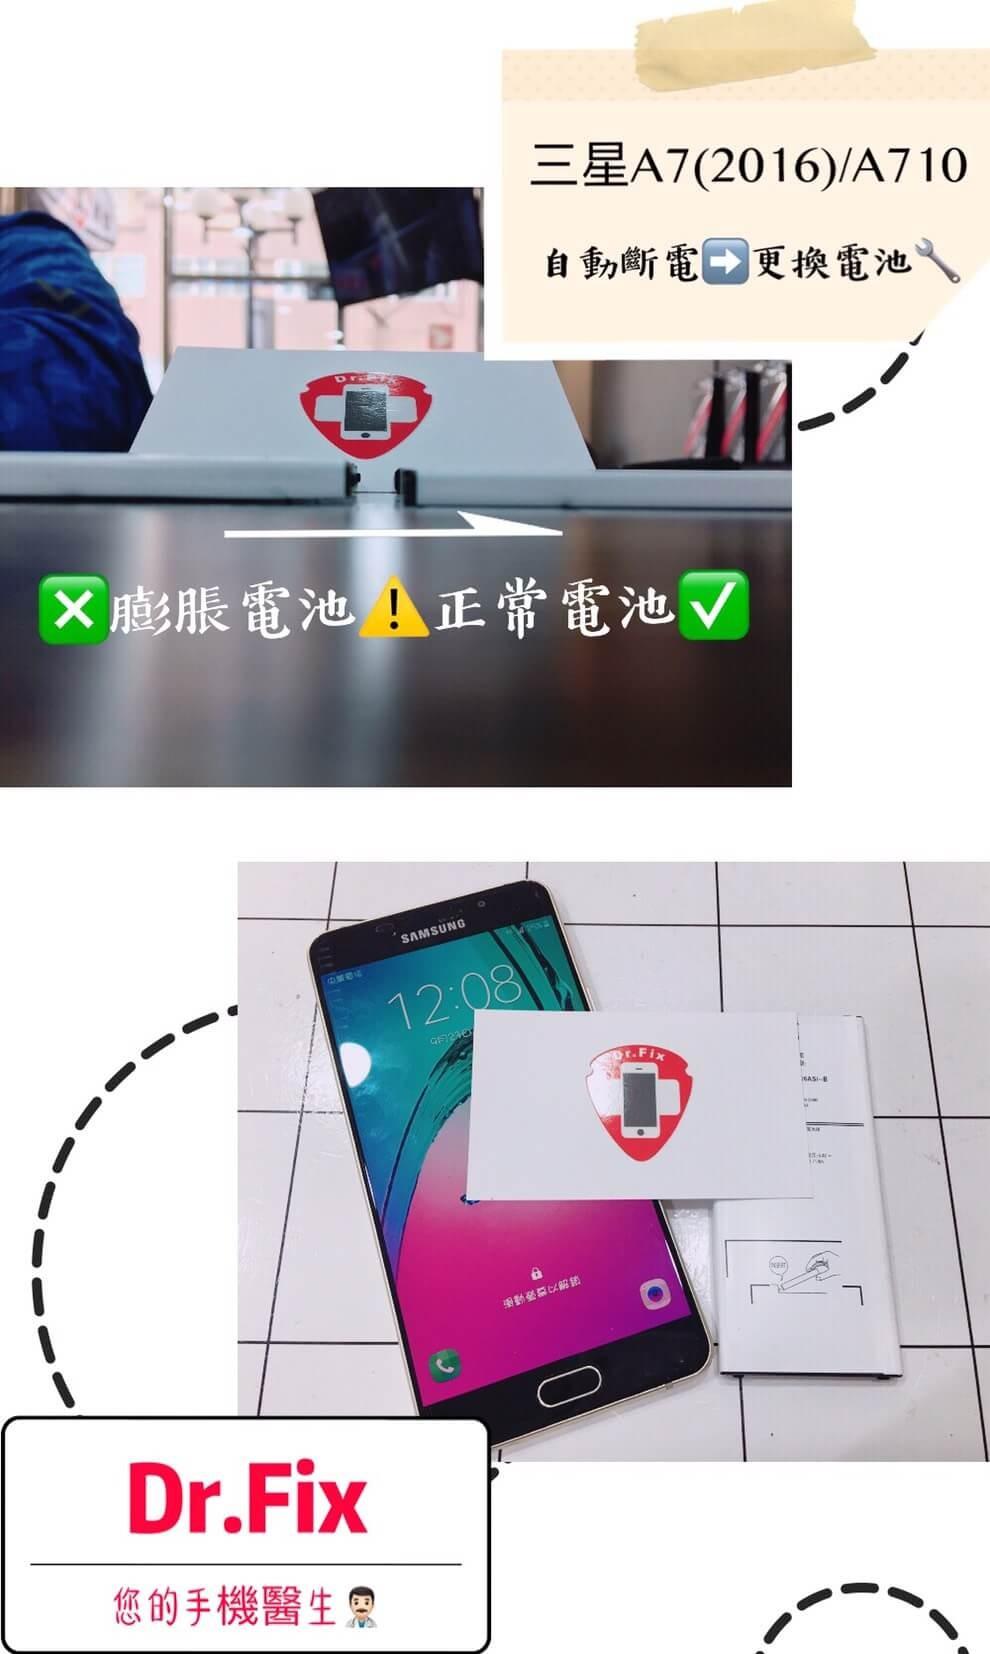 Dr.Fix中壢手機維修 A7(2016) / A710 自動斷電